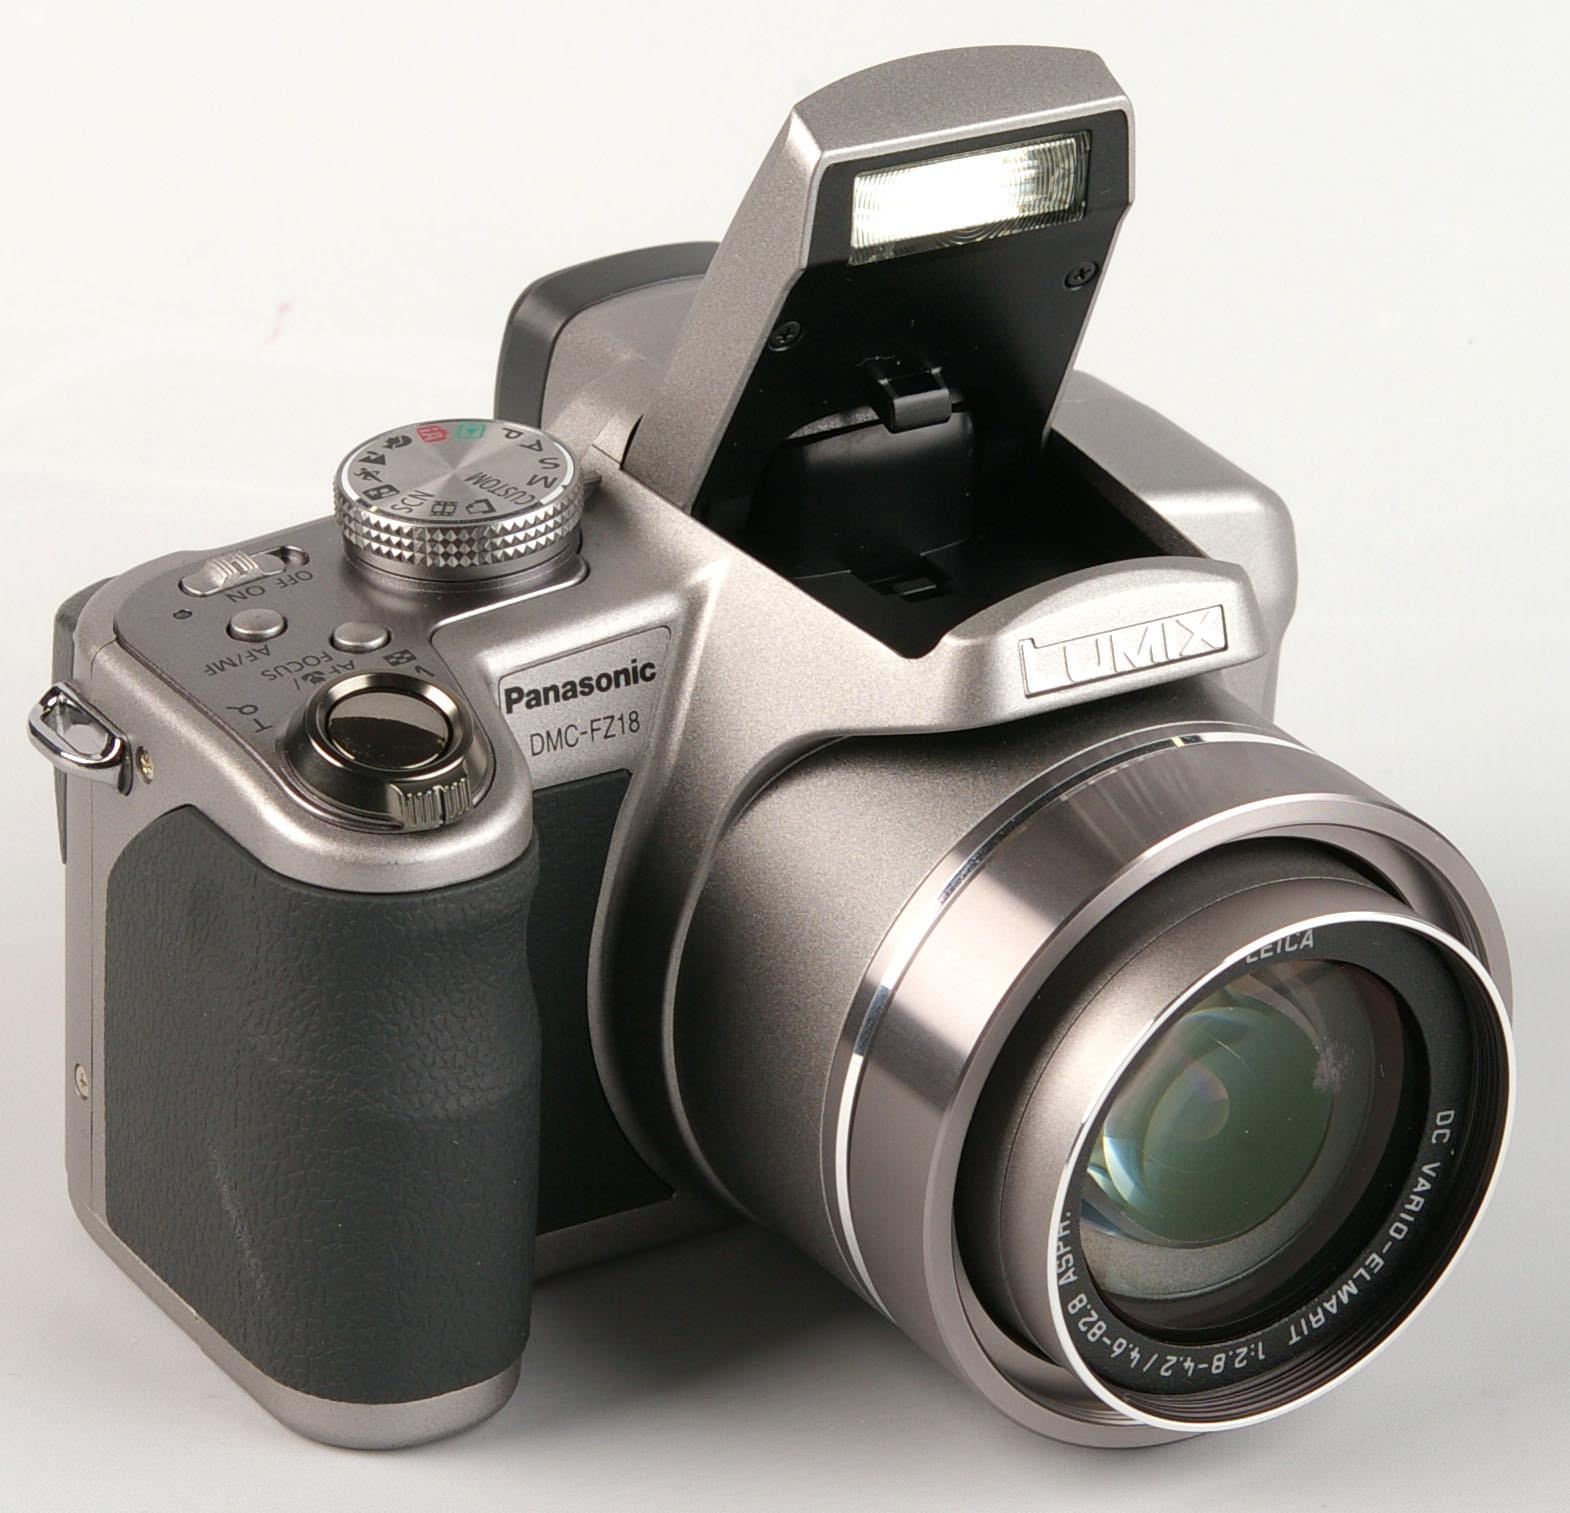 Panasonic dmc fz18 digital camera review - Batterie panasonic lumix dmc fz18 ...